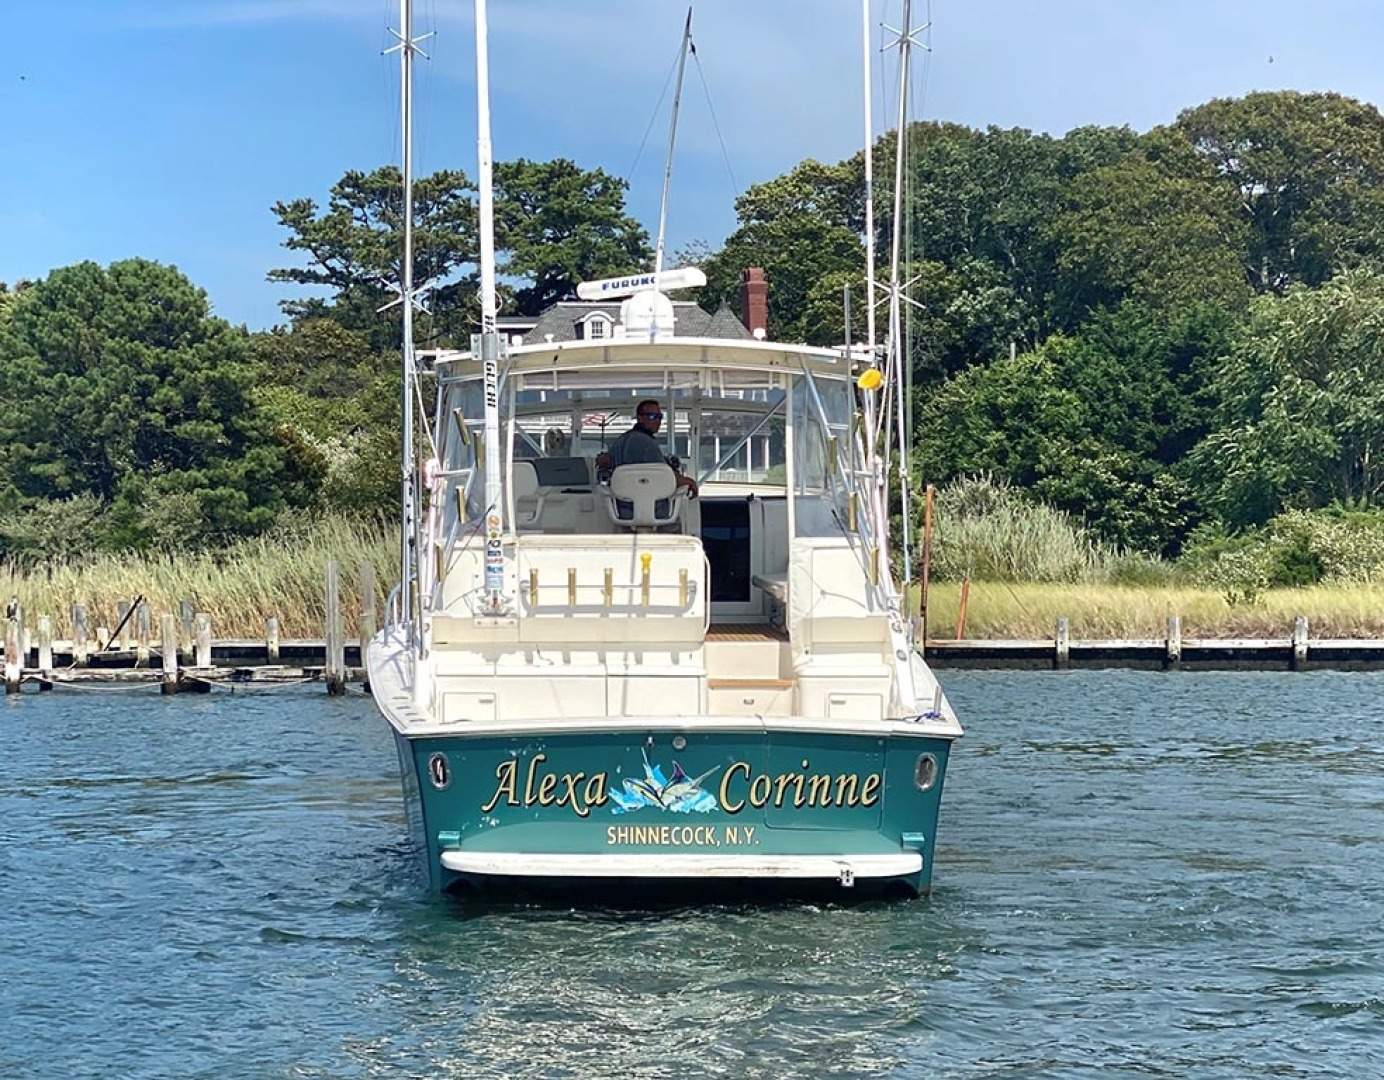 Ocean Yachts-40 Express 2001-Alexa Corinne Long Island-New York-United States-Stern-1470869 | Thumbnail